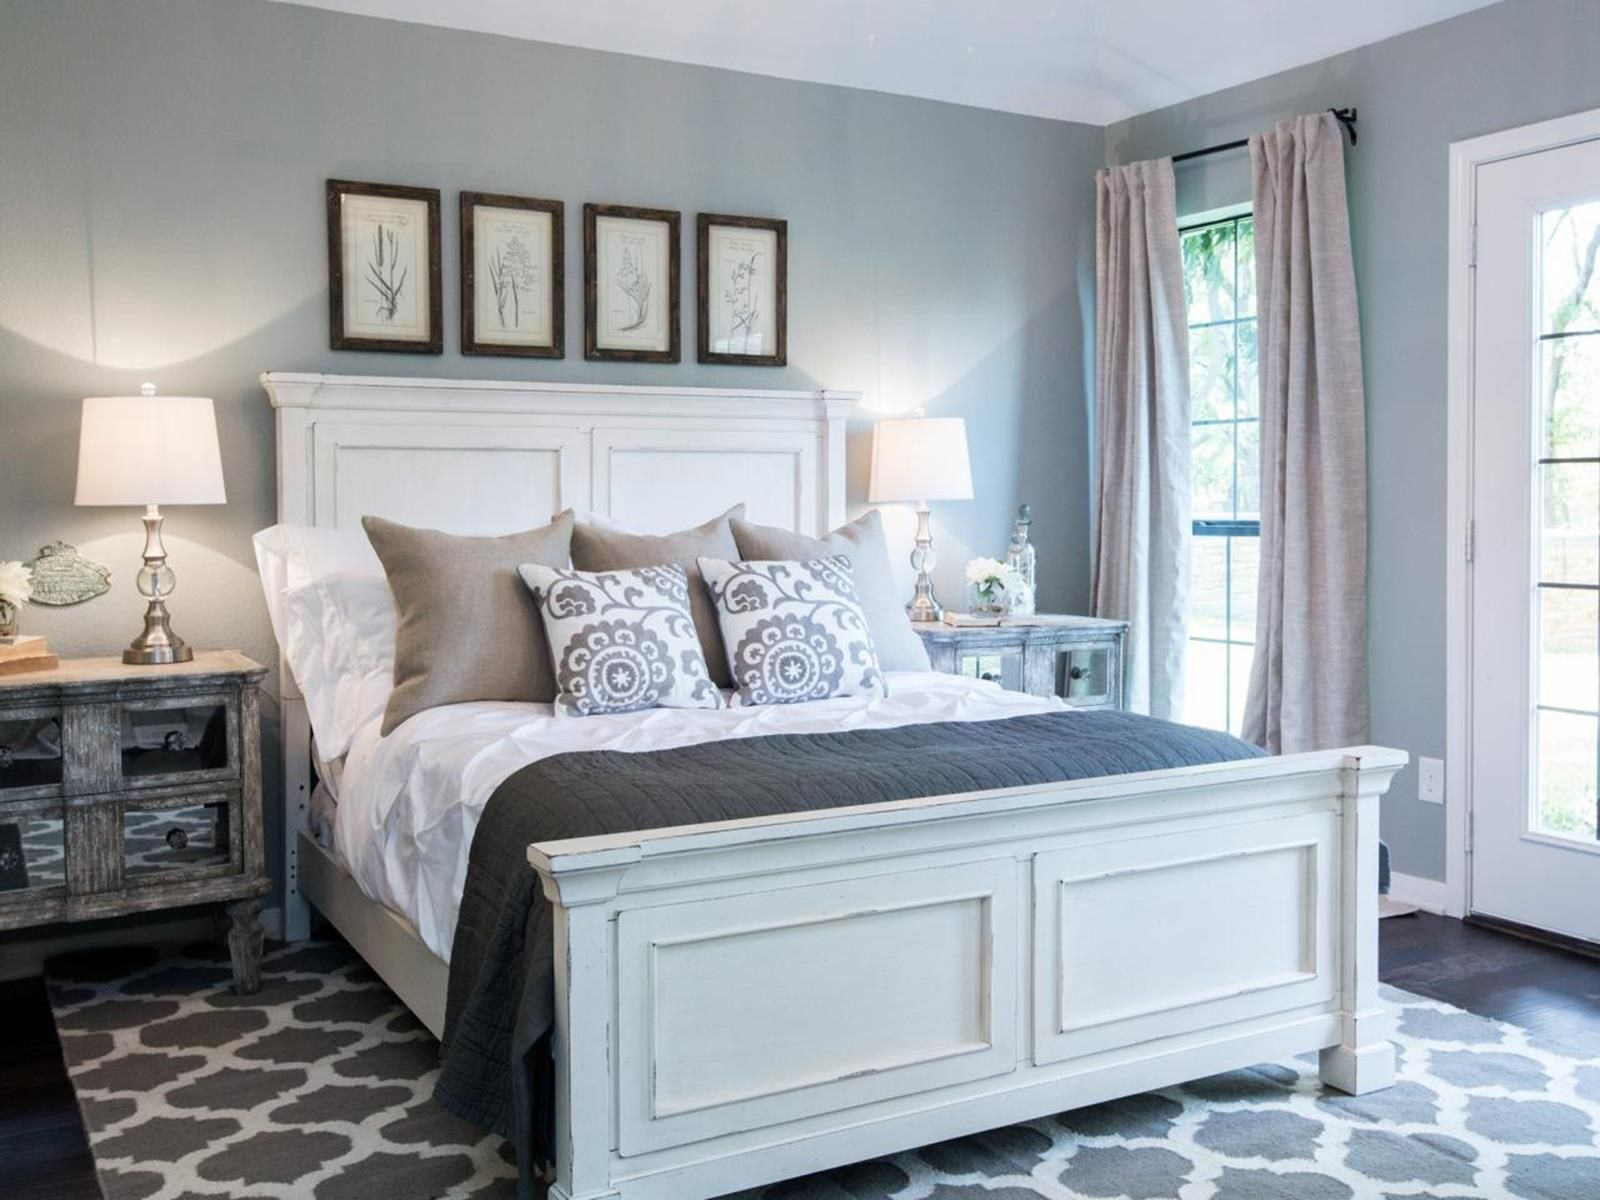 19 Amazing Warm Master Bedroom Makeover Fixer Upper Style Ideas Small Master Bedroom Master Bedrooms Decor Remodel Bedroom